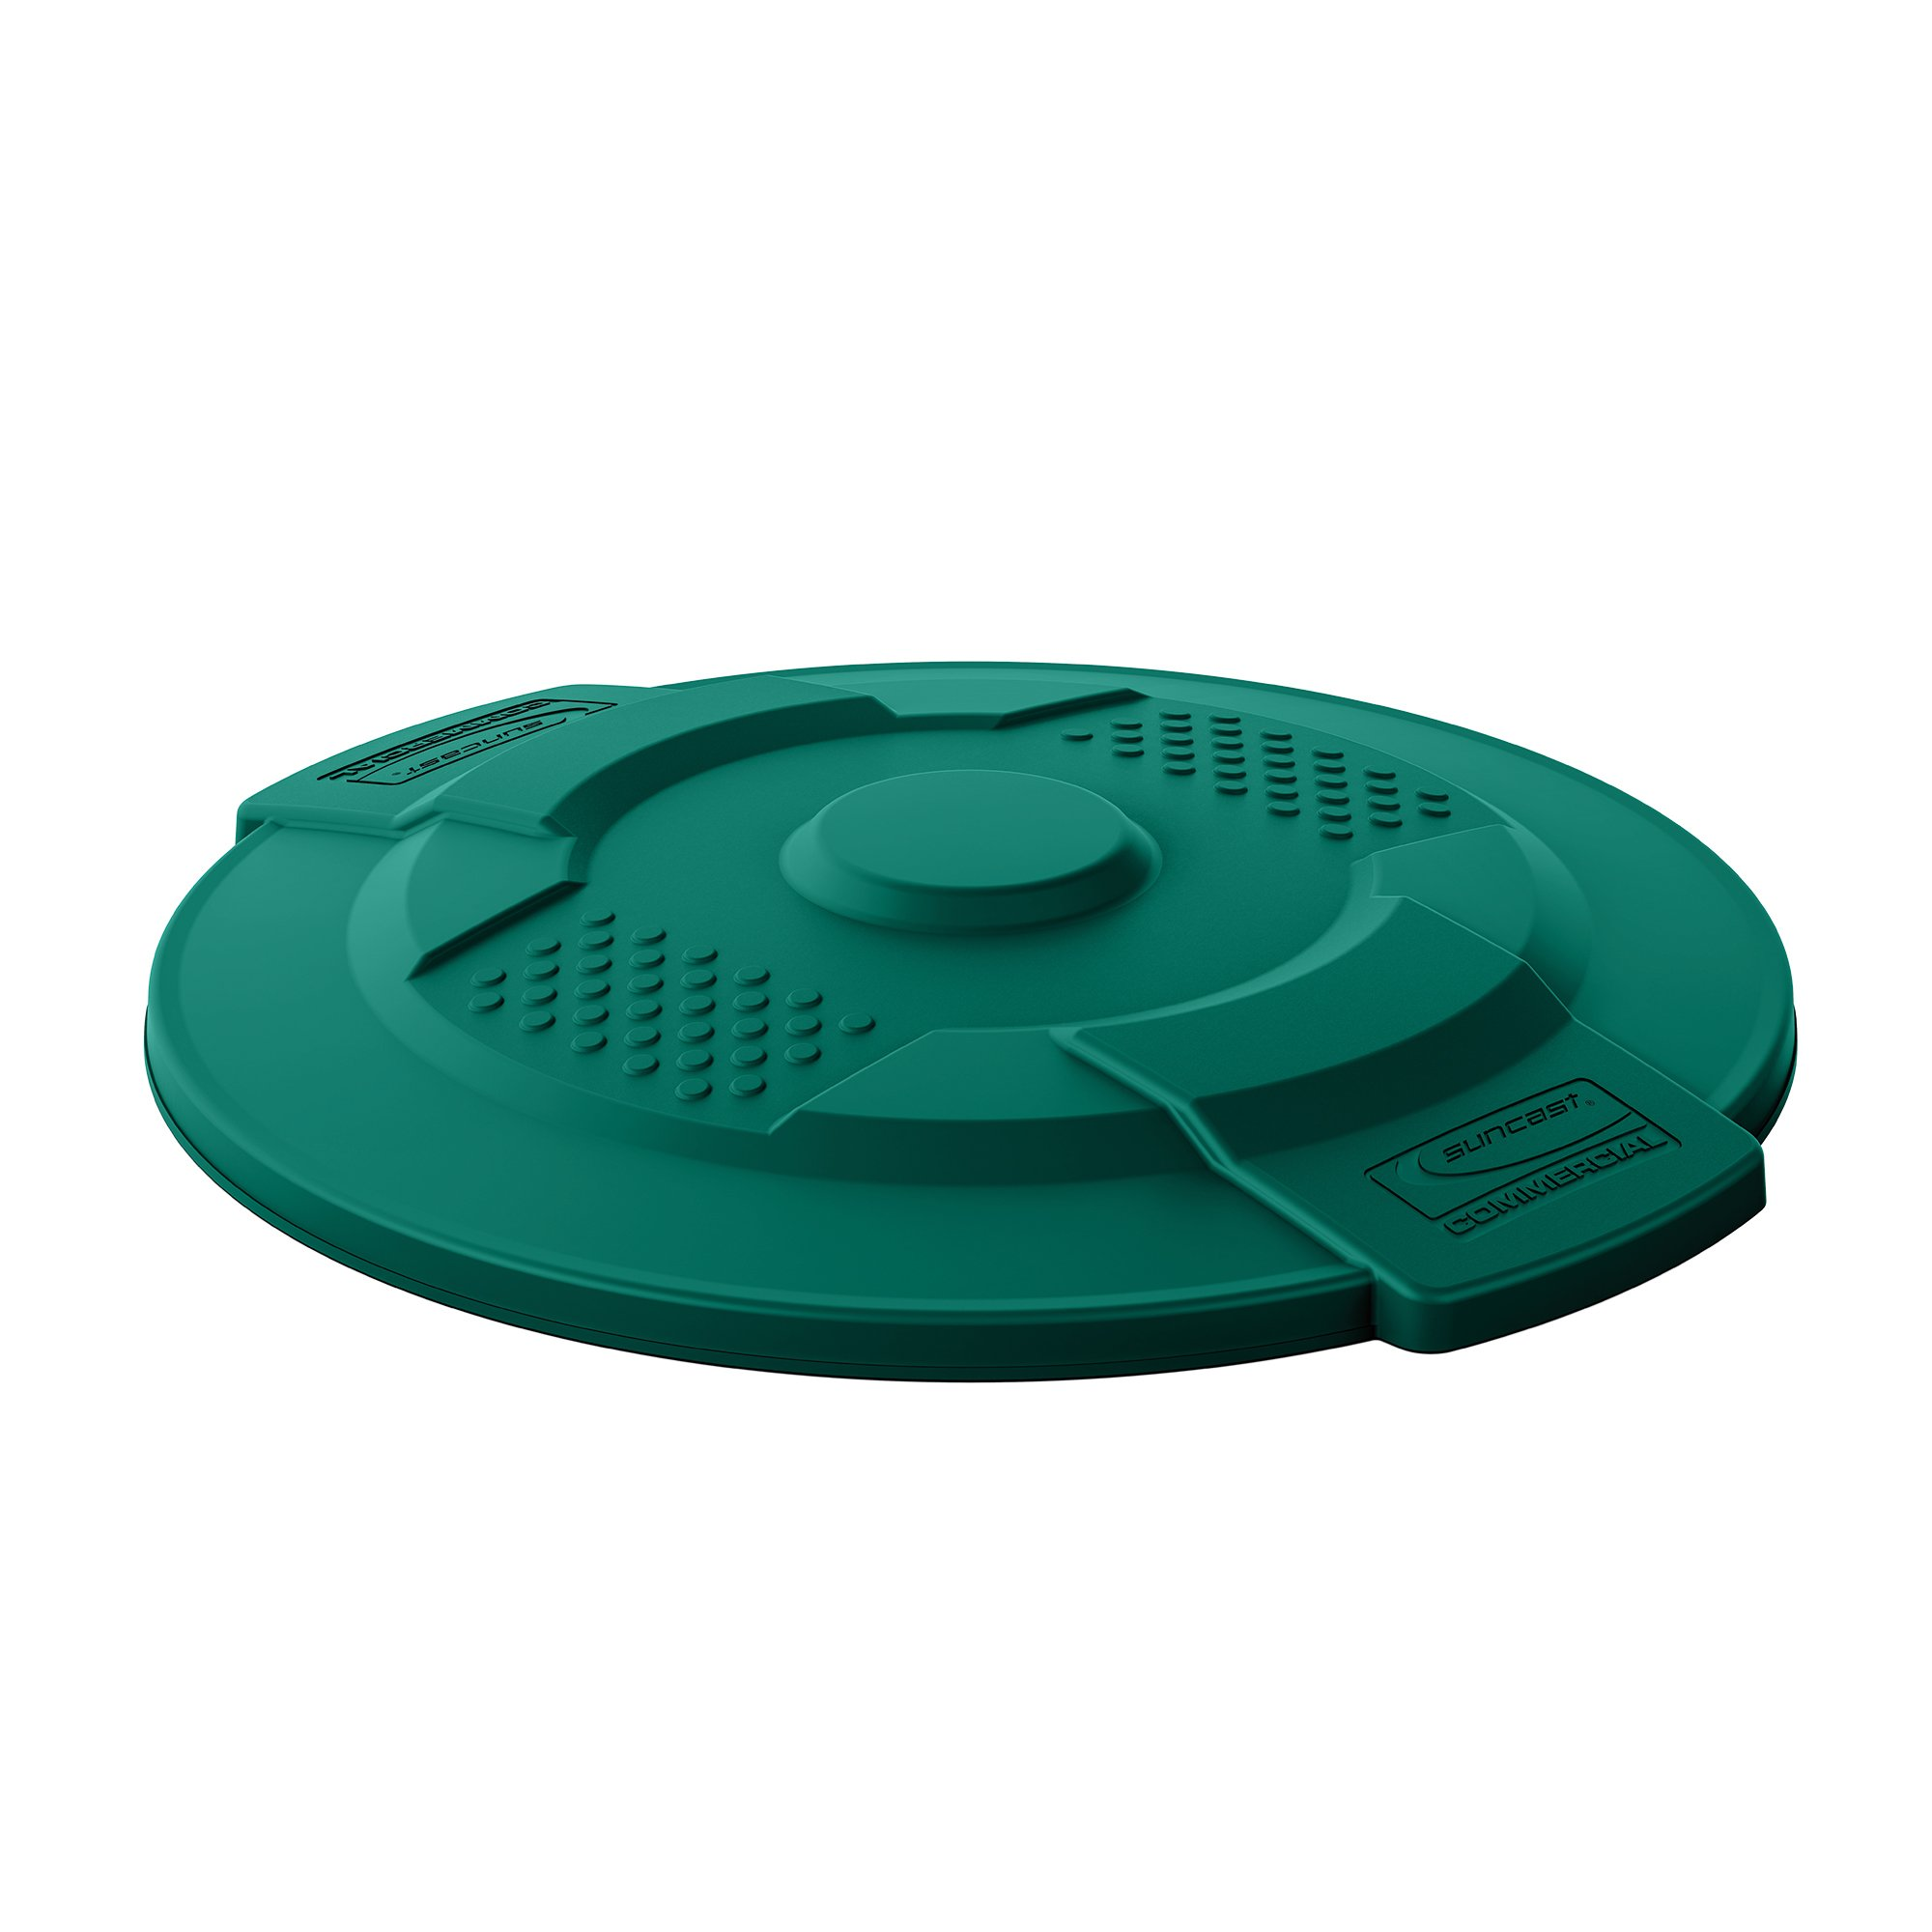 Suncast Commercial TCU20LIDG Utility Trash Can, 21.09'' Height, 2.55'' Width, 21.09'' Length, Plastic, Green